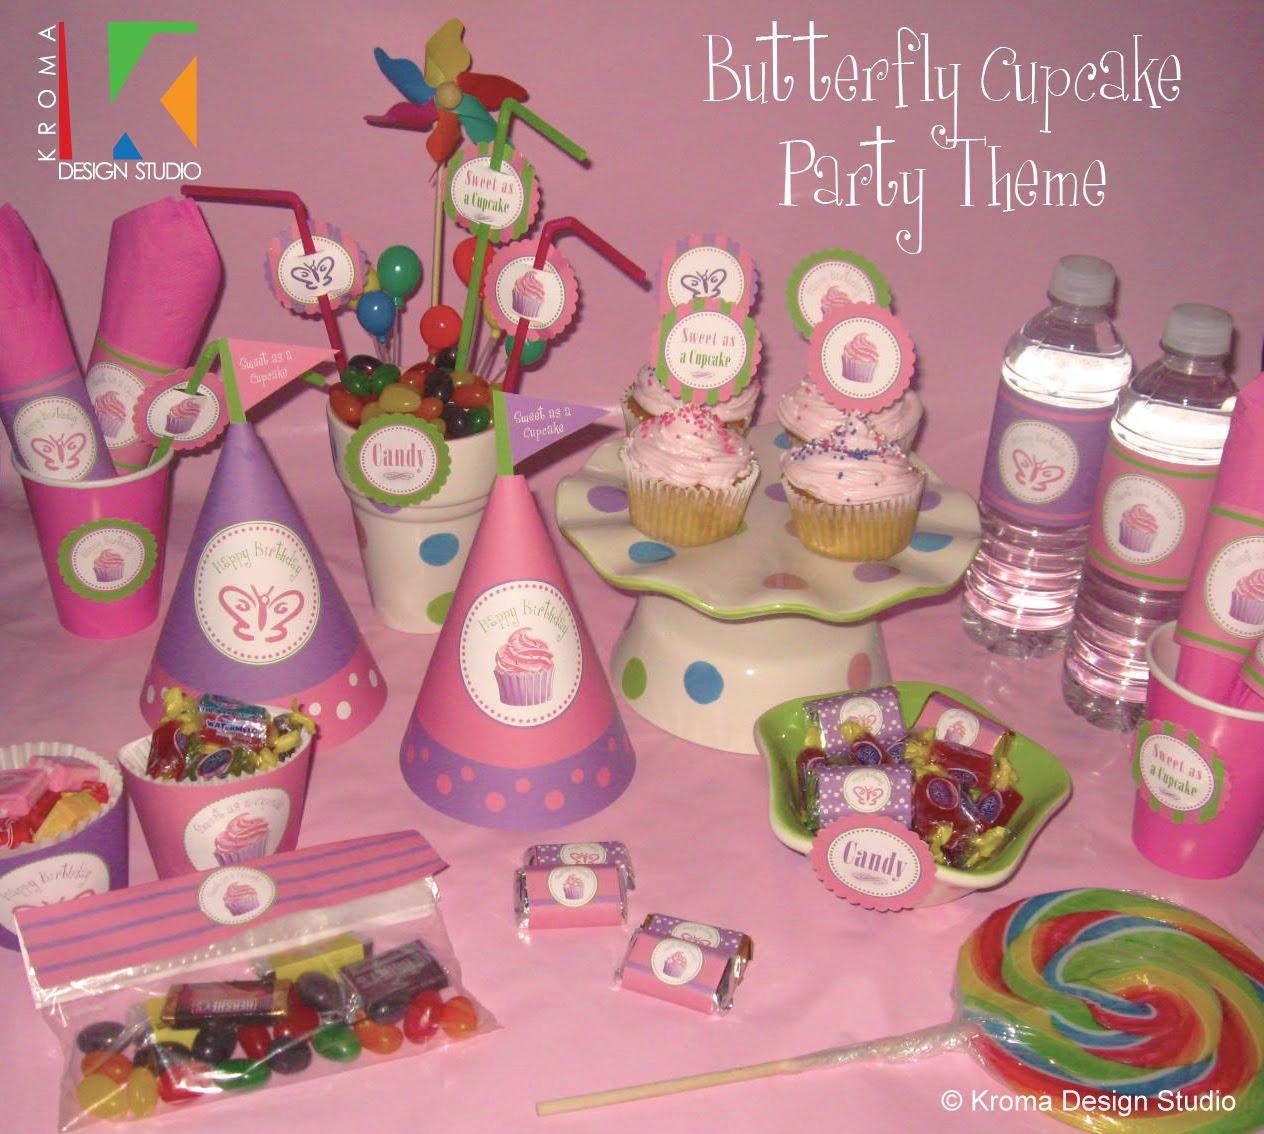 http://4.bp.blogspot.com/_vJf-5fc8cSo/TA6PRgJFEHI/AAAAAAAAABU/rXcsYon7bsI/s1600/cupcake%20theme%20party%20kit-c.jpg